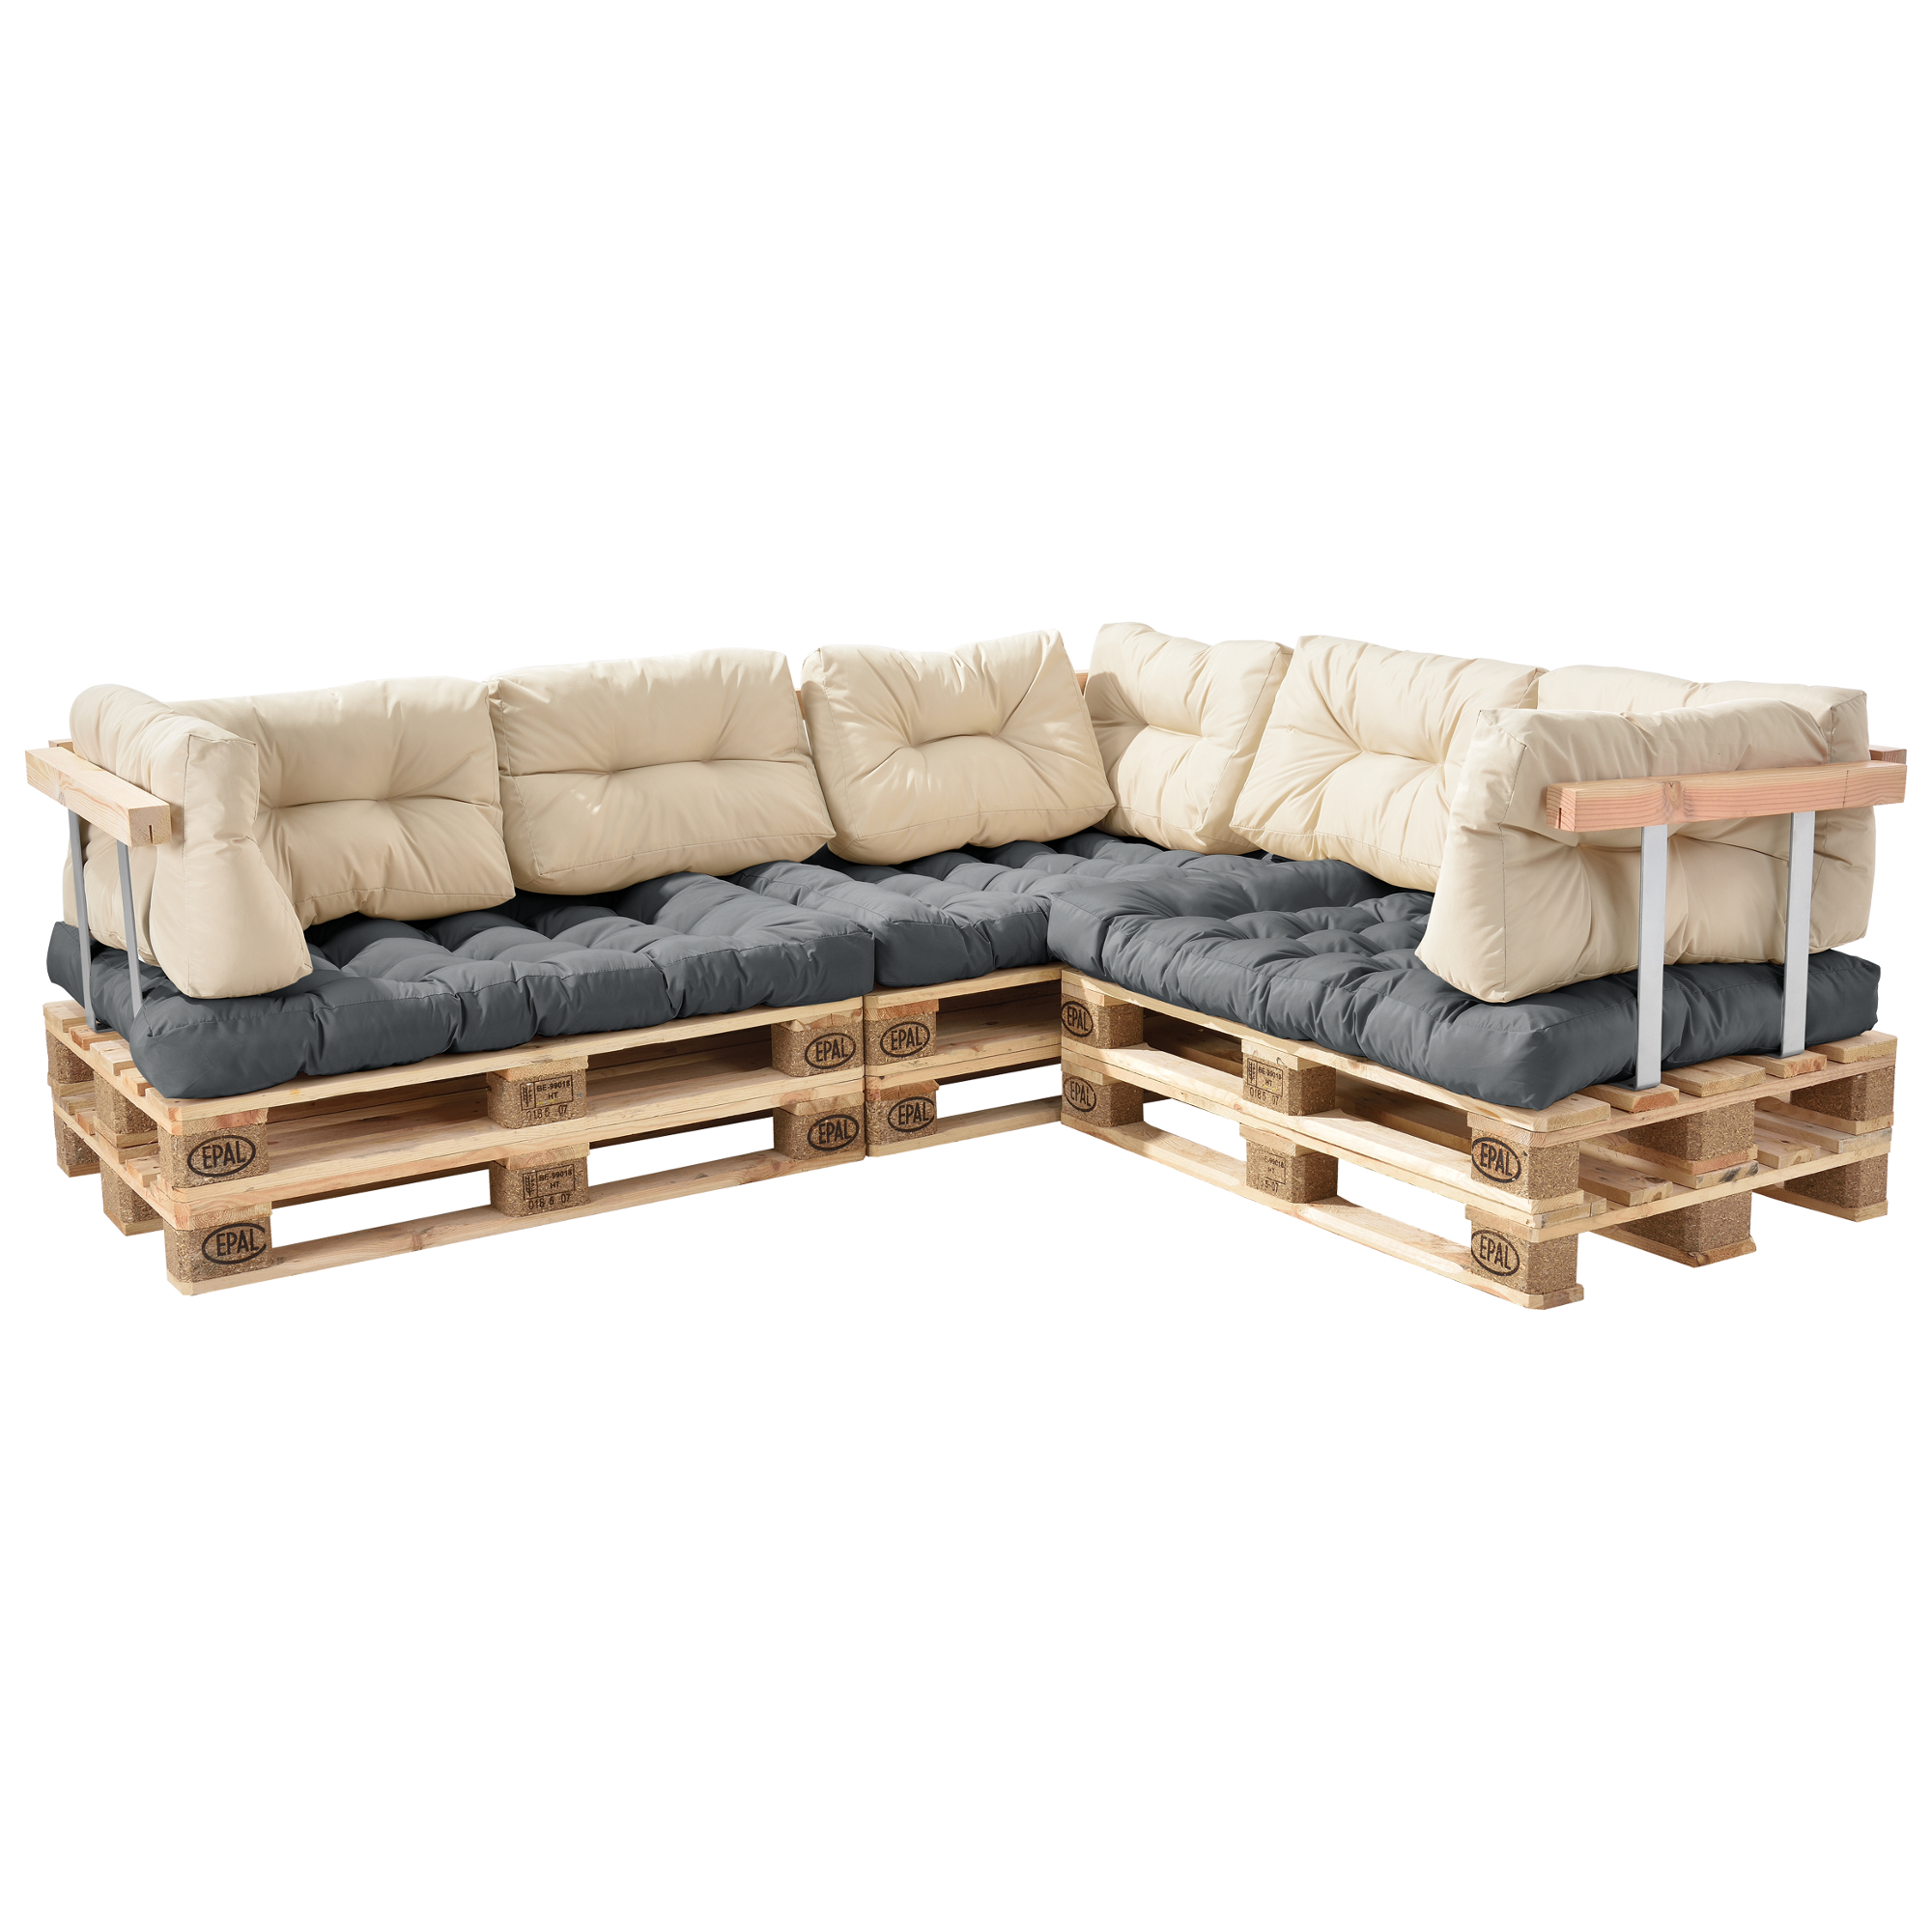 palettenkissen in outdoor paletten kissen sofa. Black Bedroom Furniture Sets. Home Design Ideas